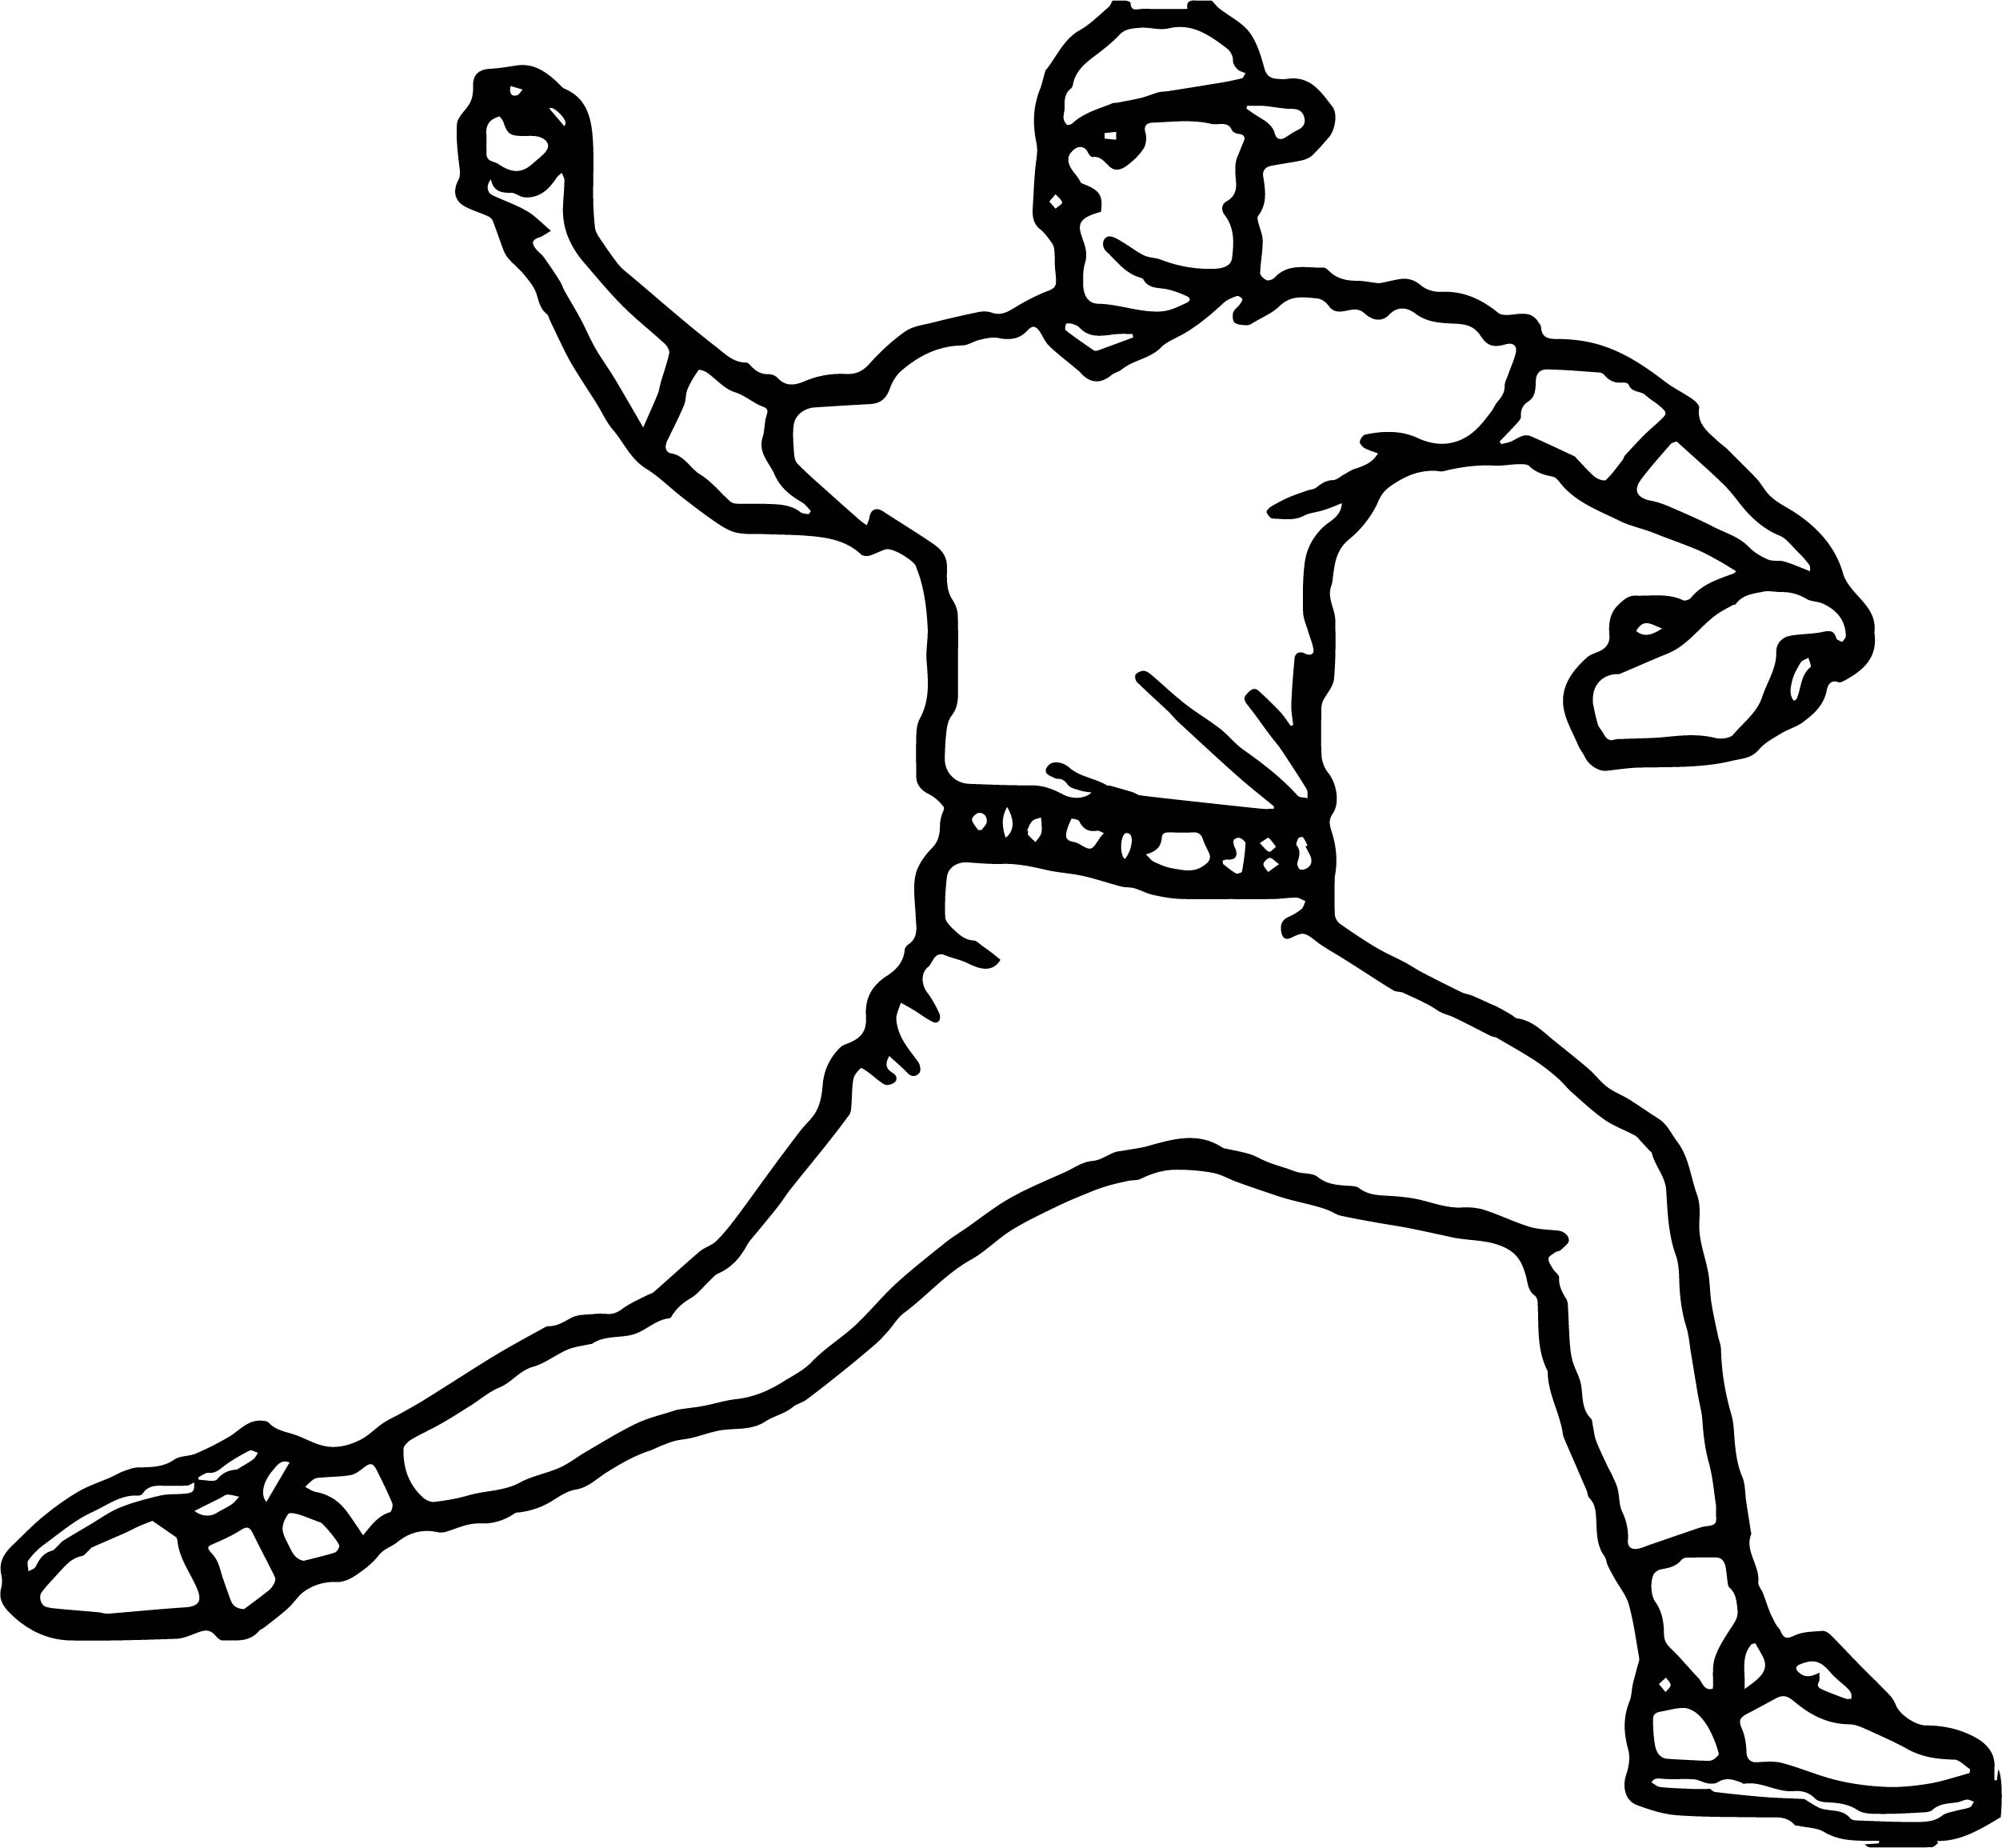 Baseball pitcher outline